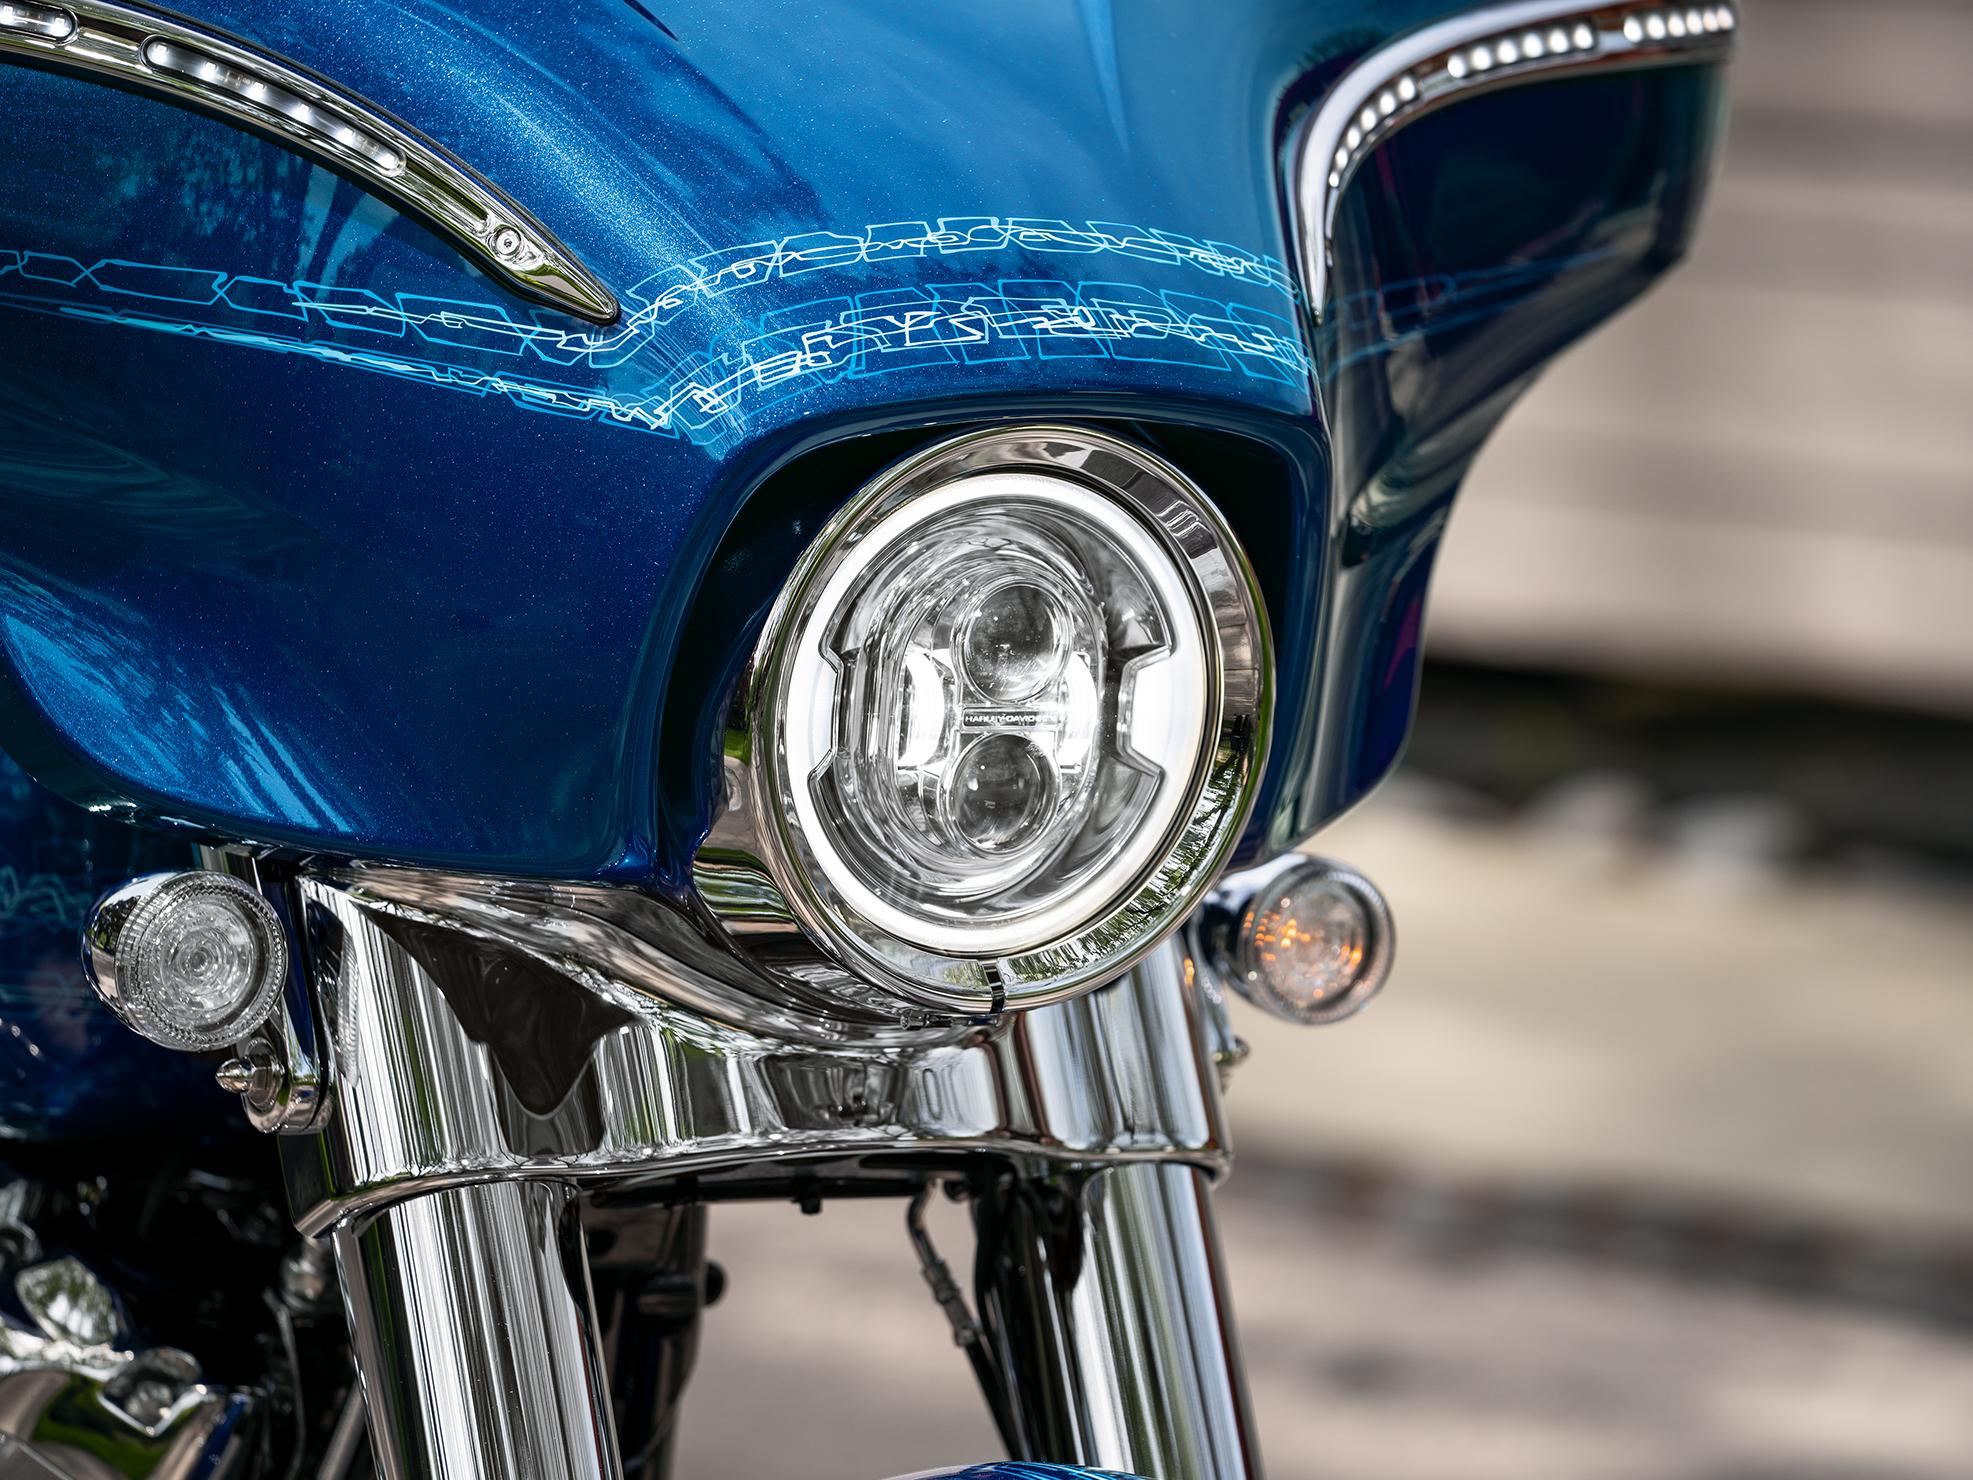 2019 Street Glide Motorcycle | Harley-Davidson USA